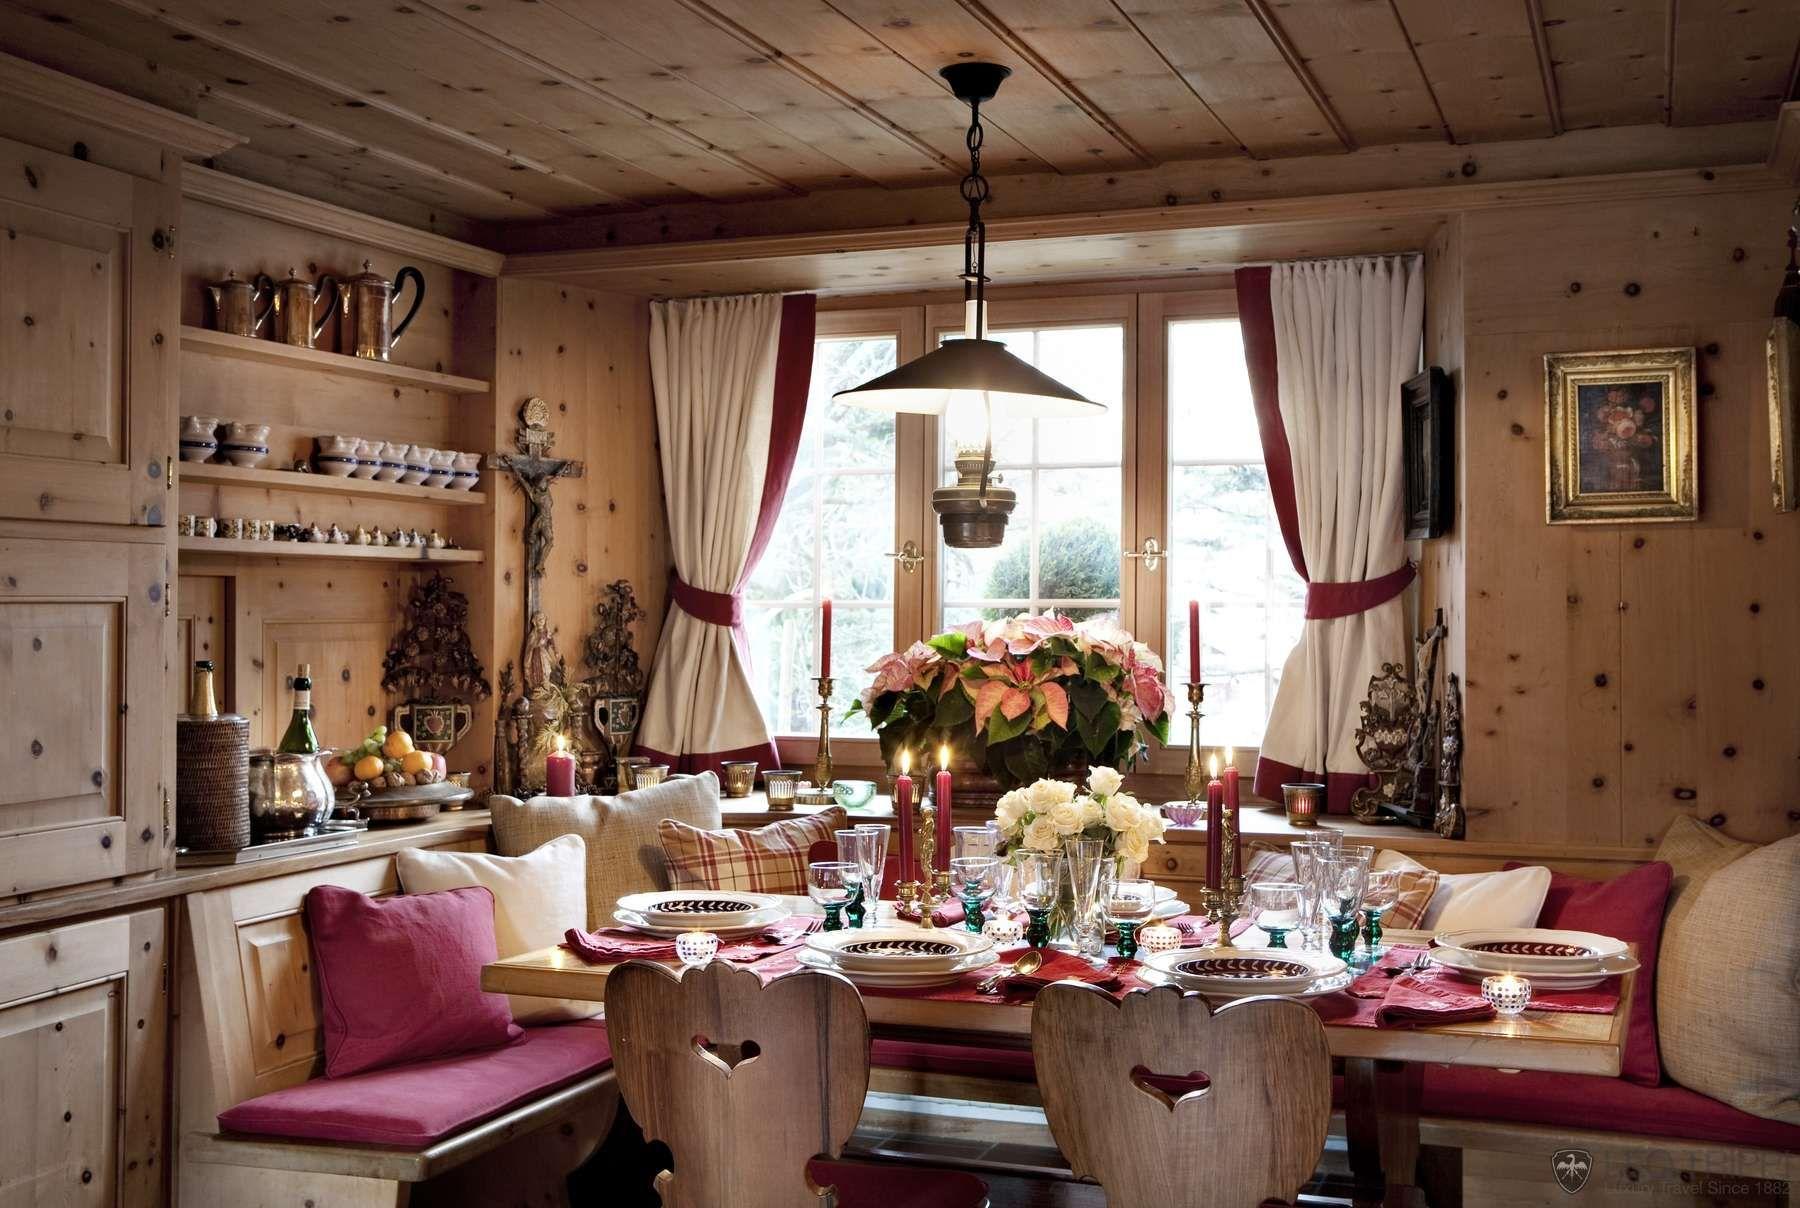 klosters luxury chalets chalet maldeghem klosters haus bergh tte pinterest schweizer. Black Bedroom Furniture Sets. Home Design Ideas